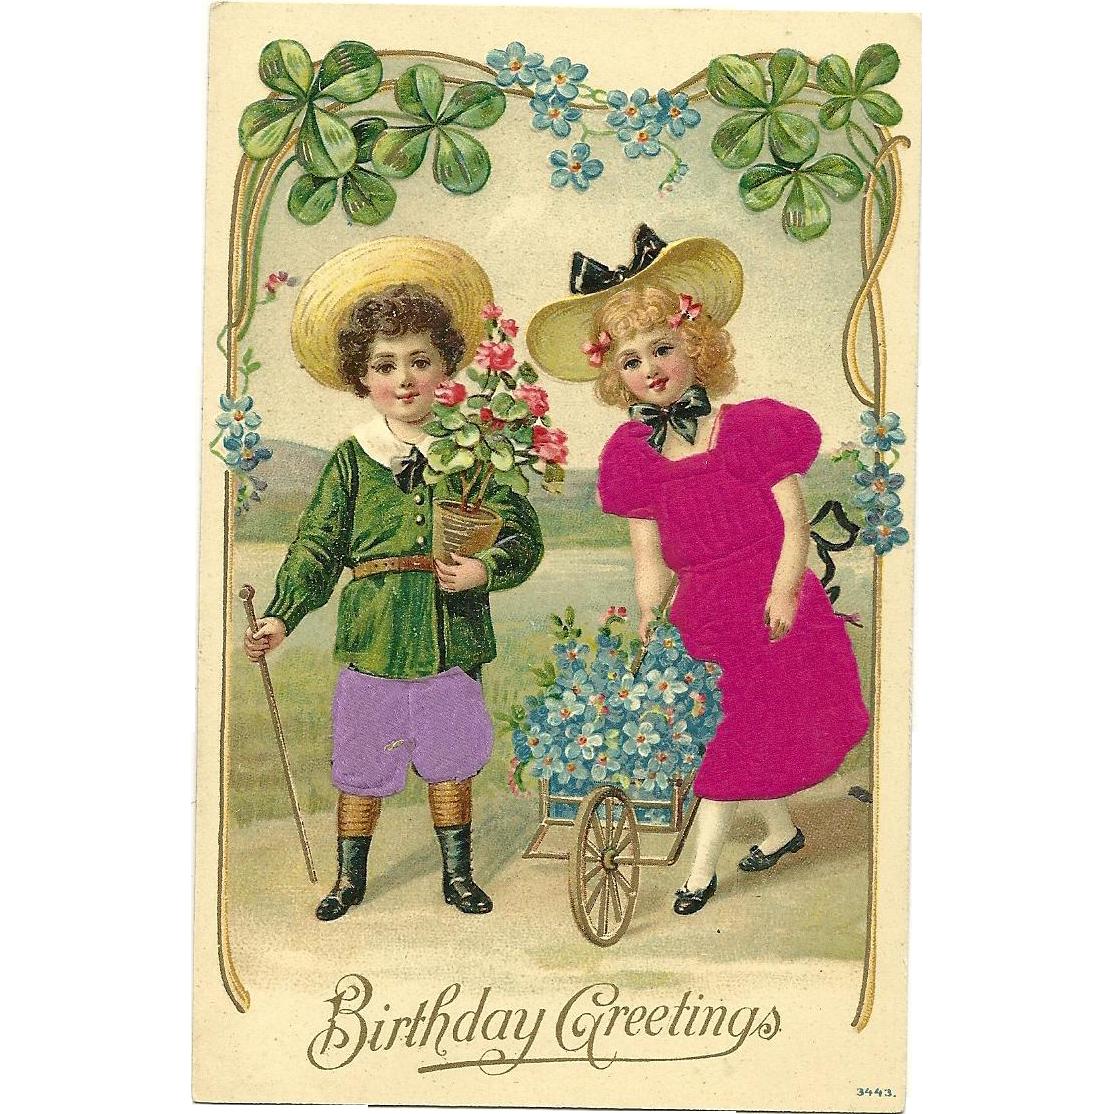 Vintage Silk Postcard Birthday greetin with children flowers and good 4 leaf luck clovers #3443